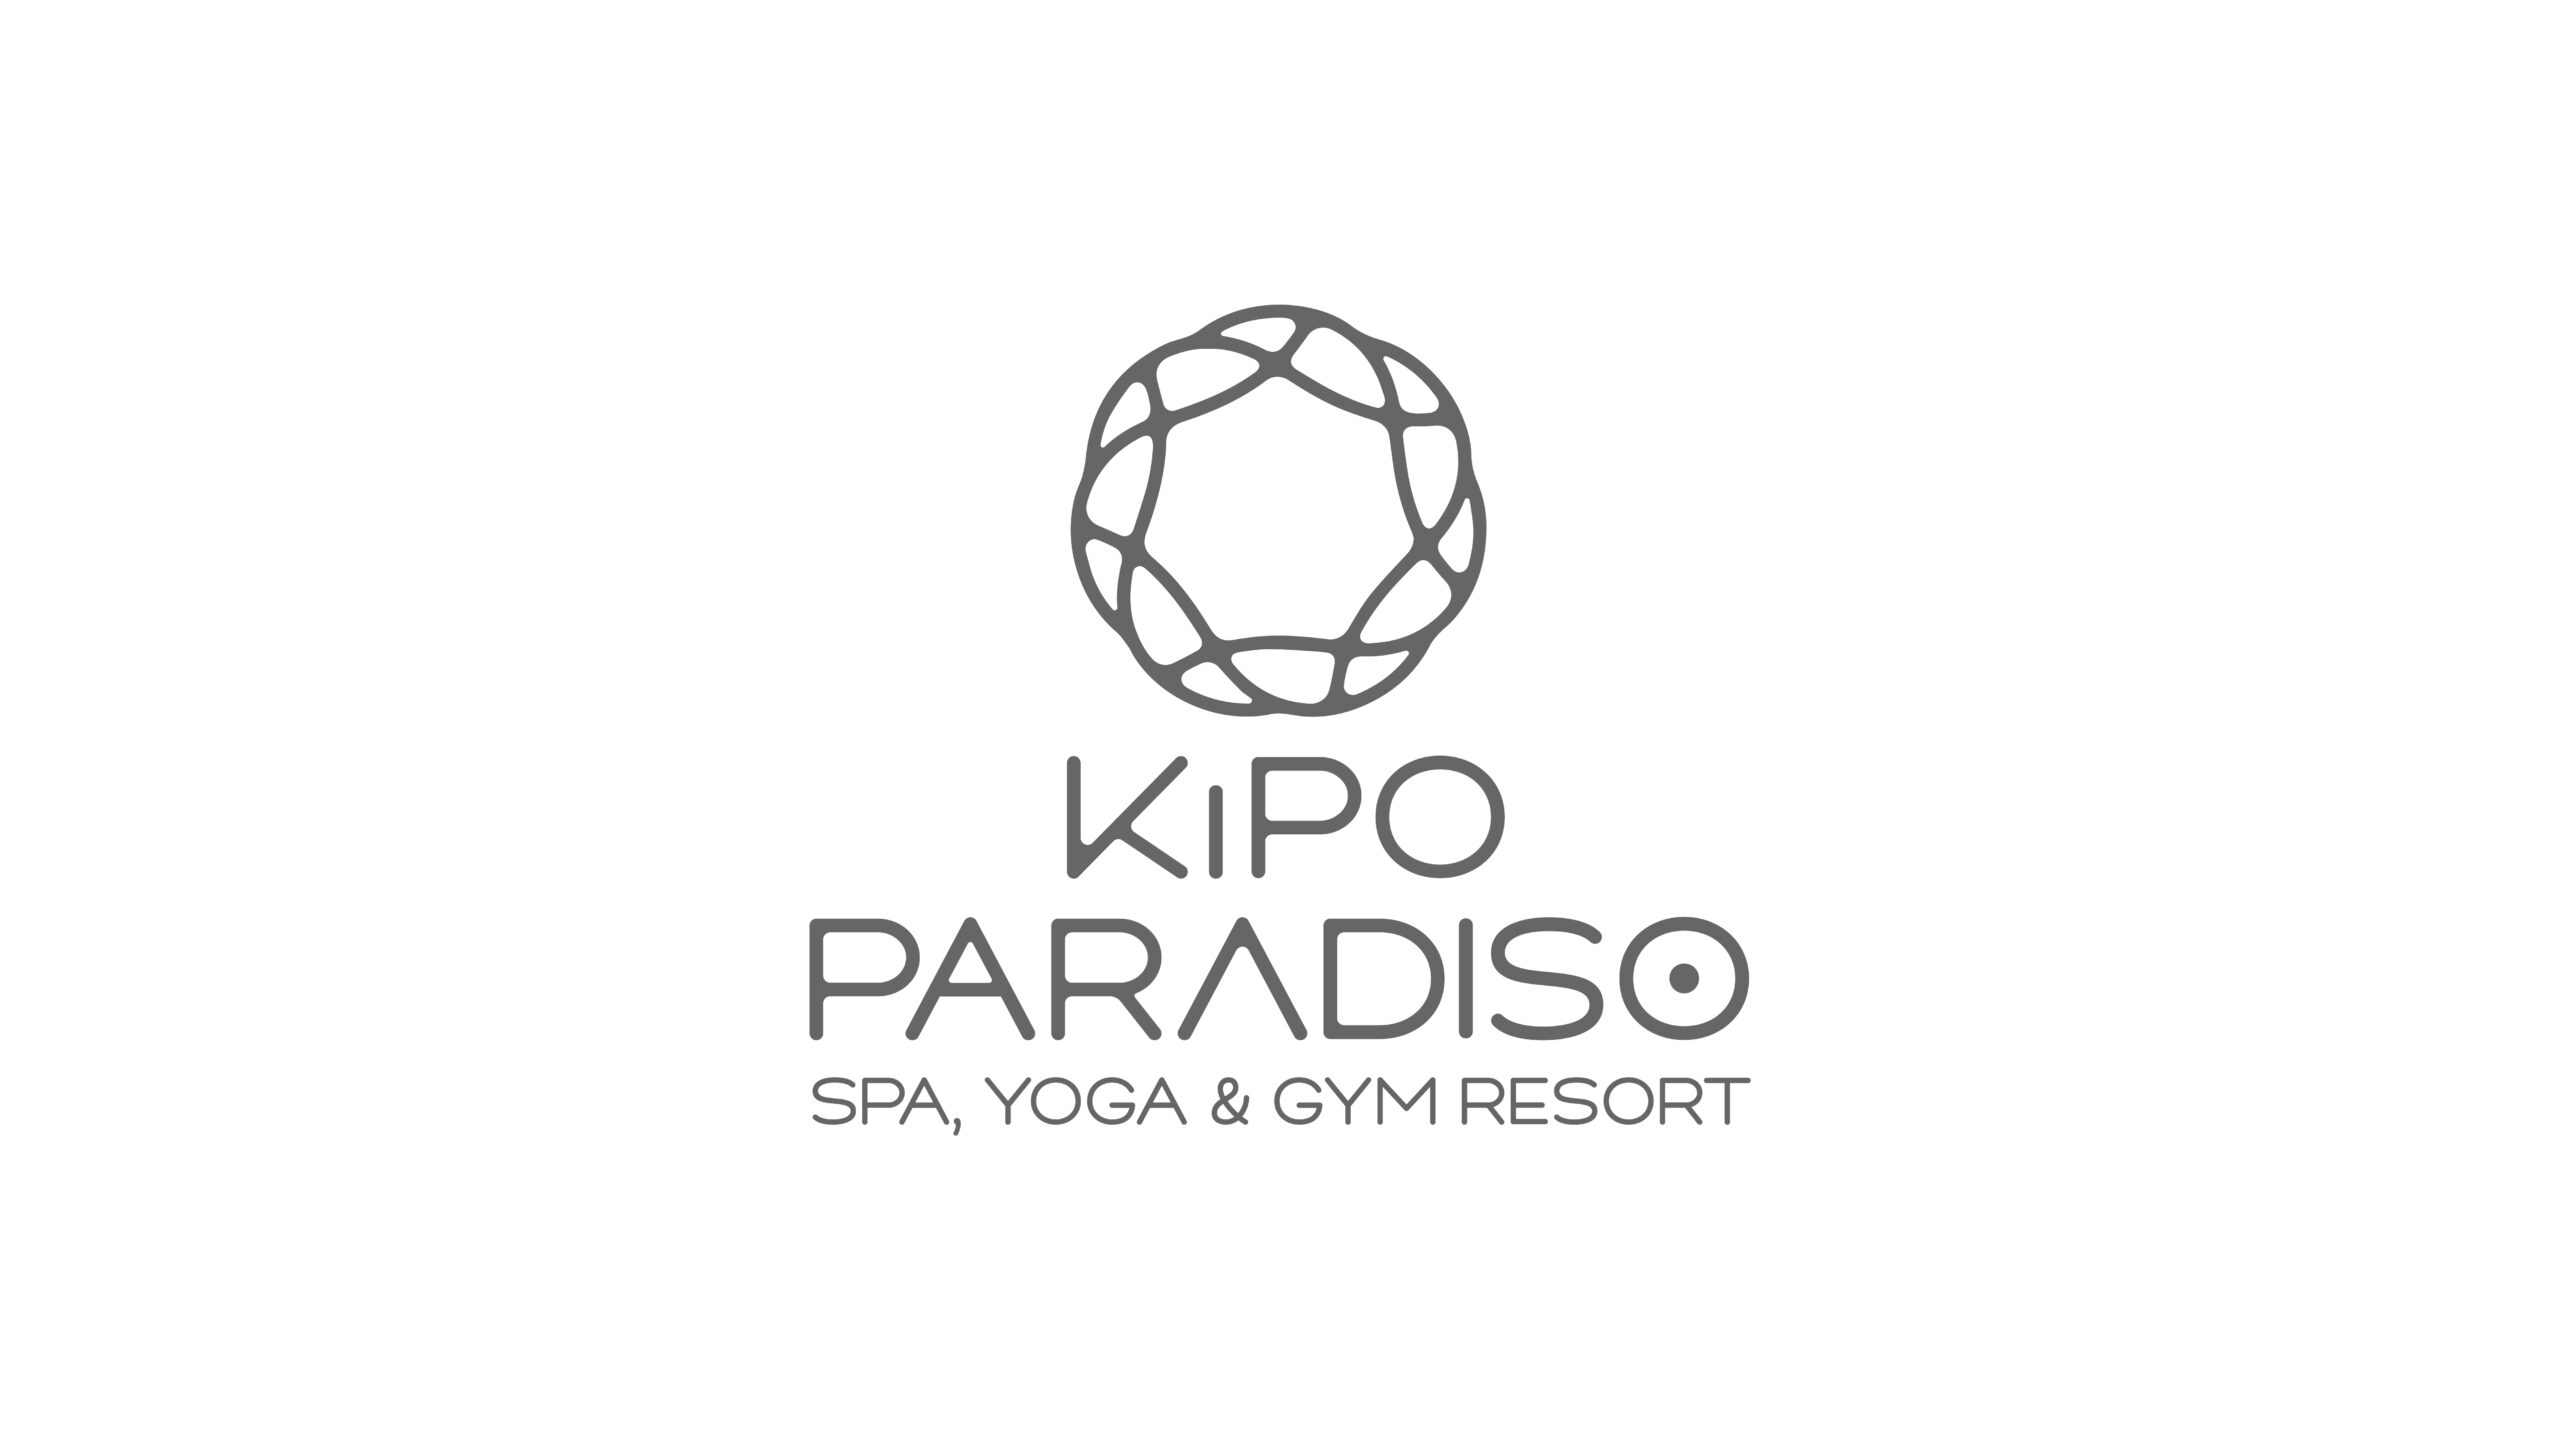 kipo paradiso spa yoga & Gym resort